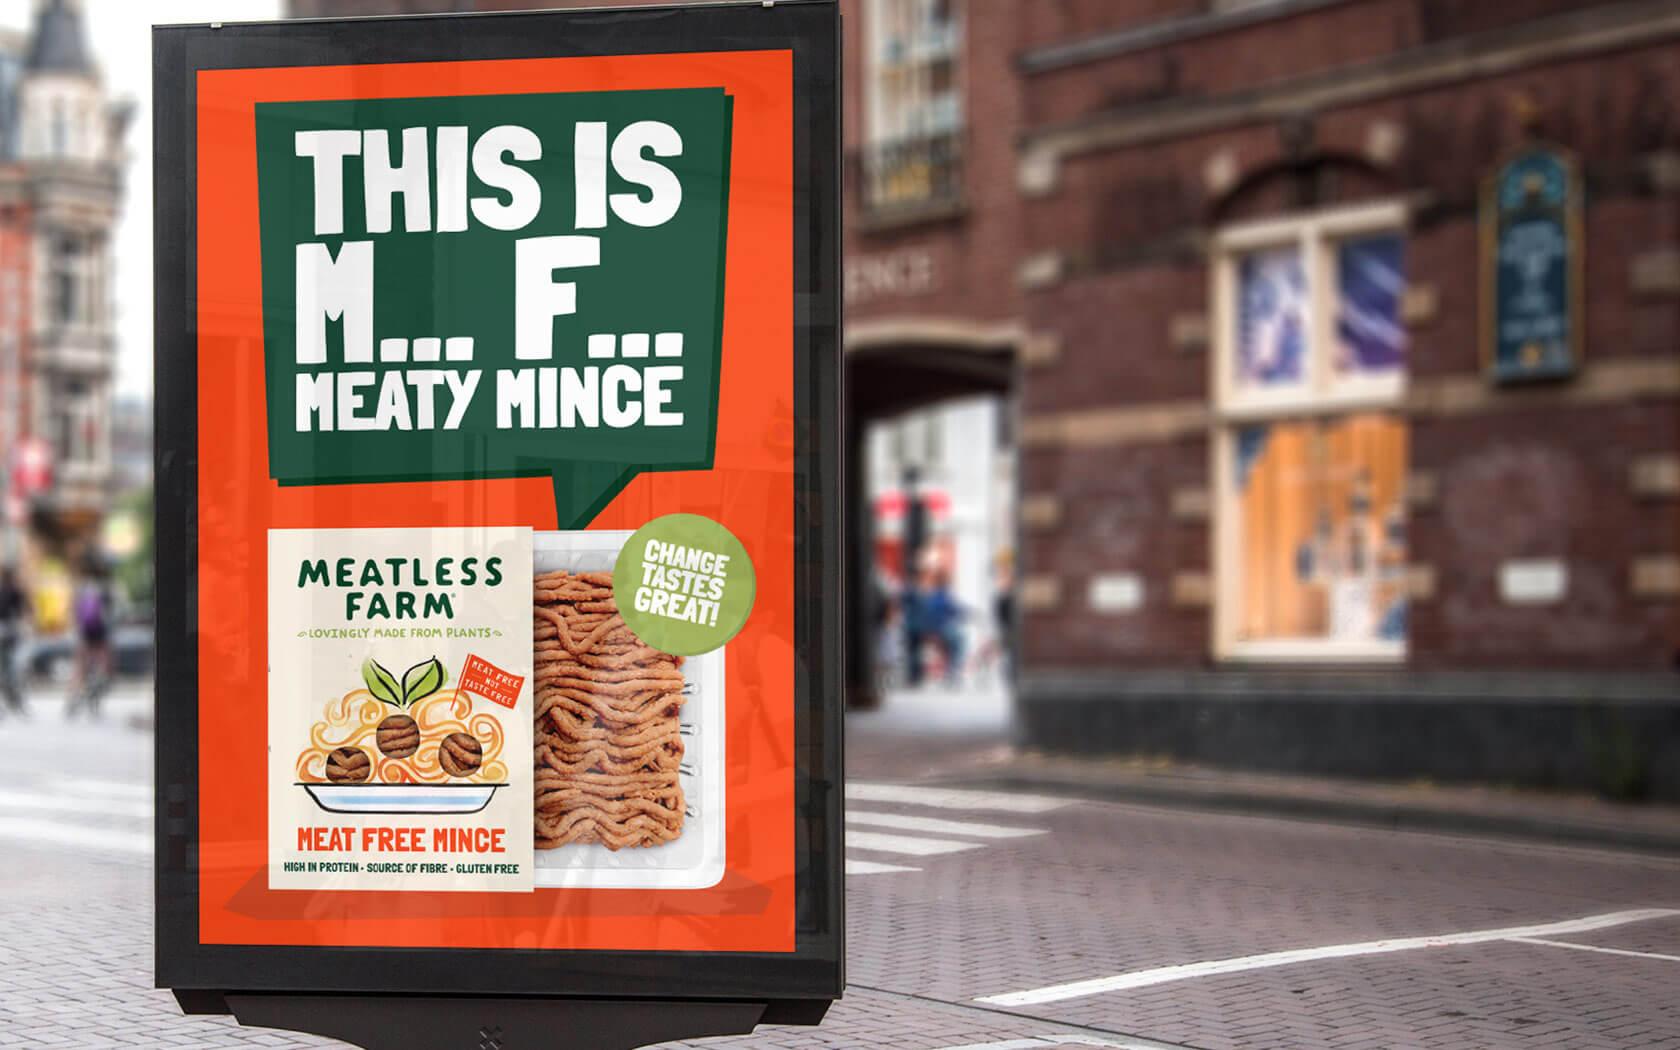 Meatless Farm M*** F*** campaign advert